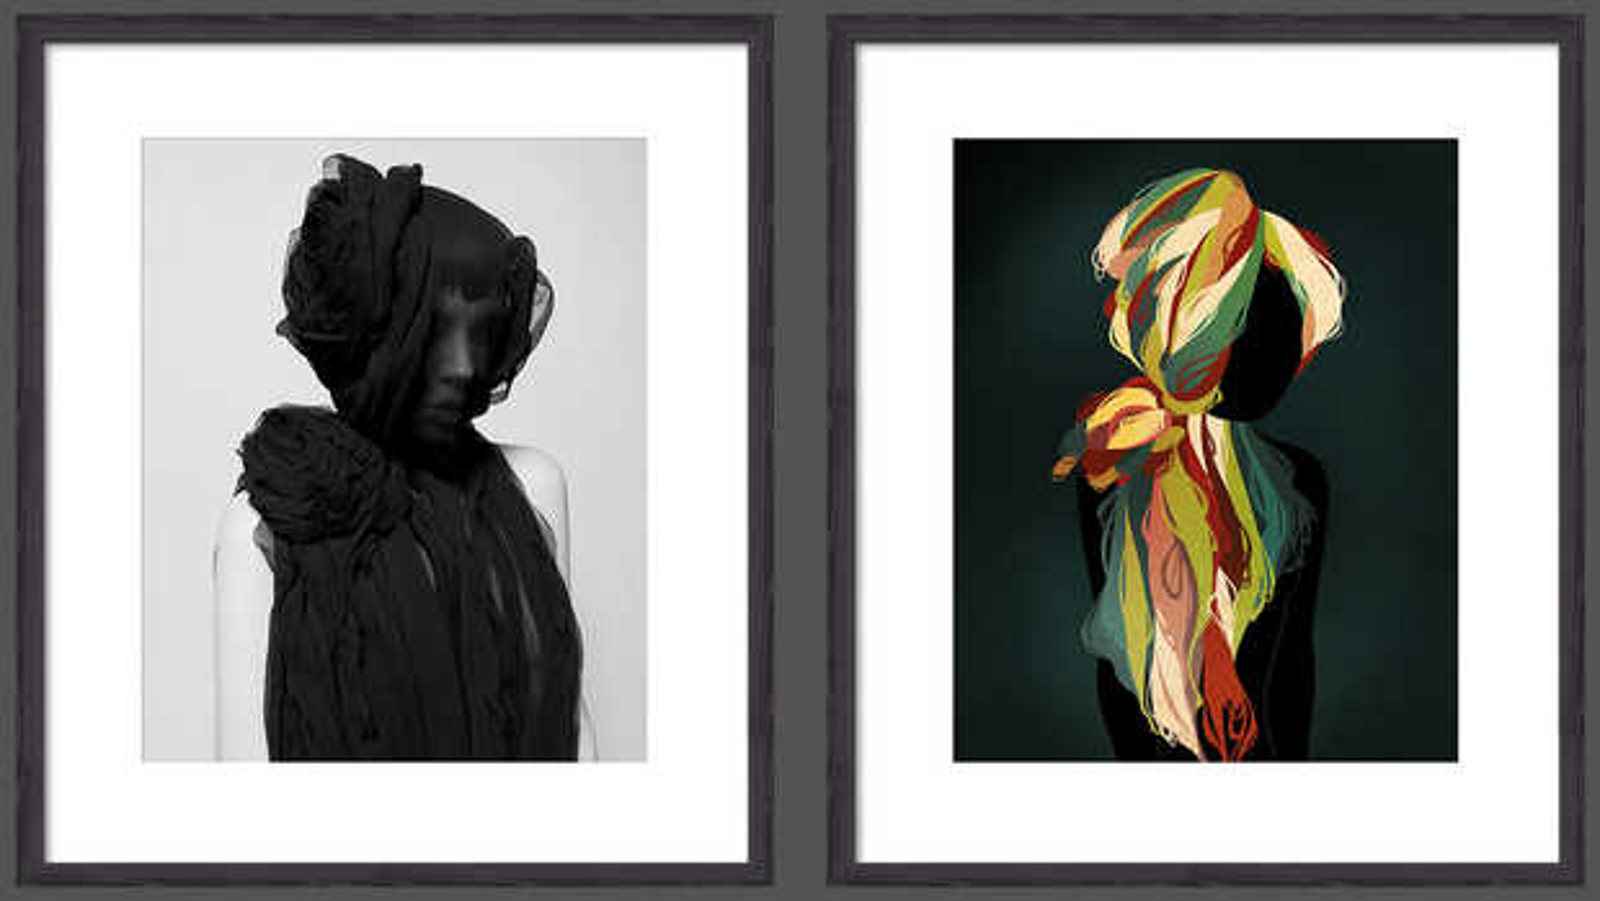 Black Roses, Lesja Chernish - Joachim Baldauf